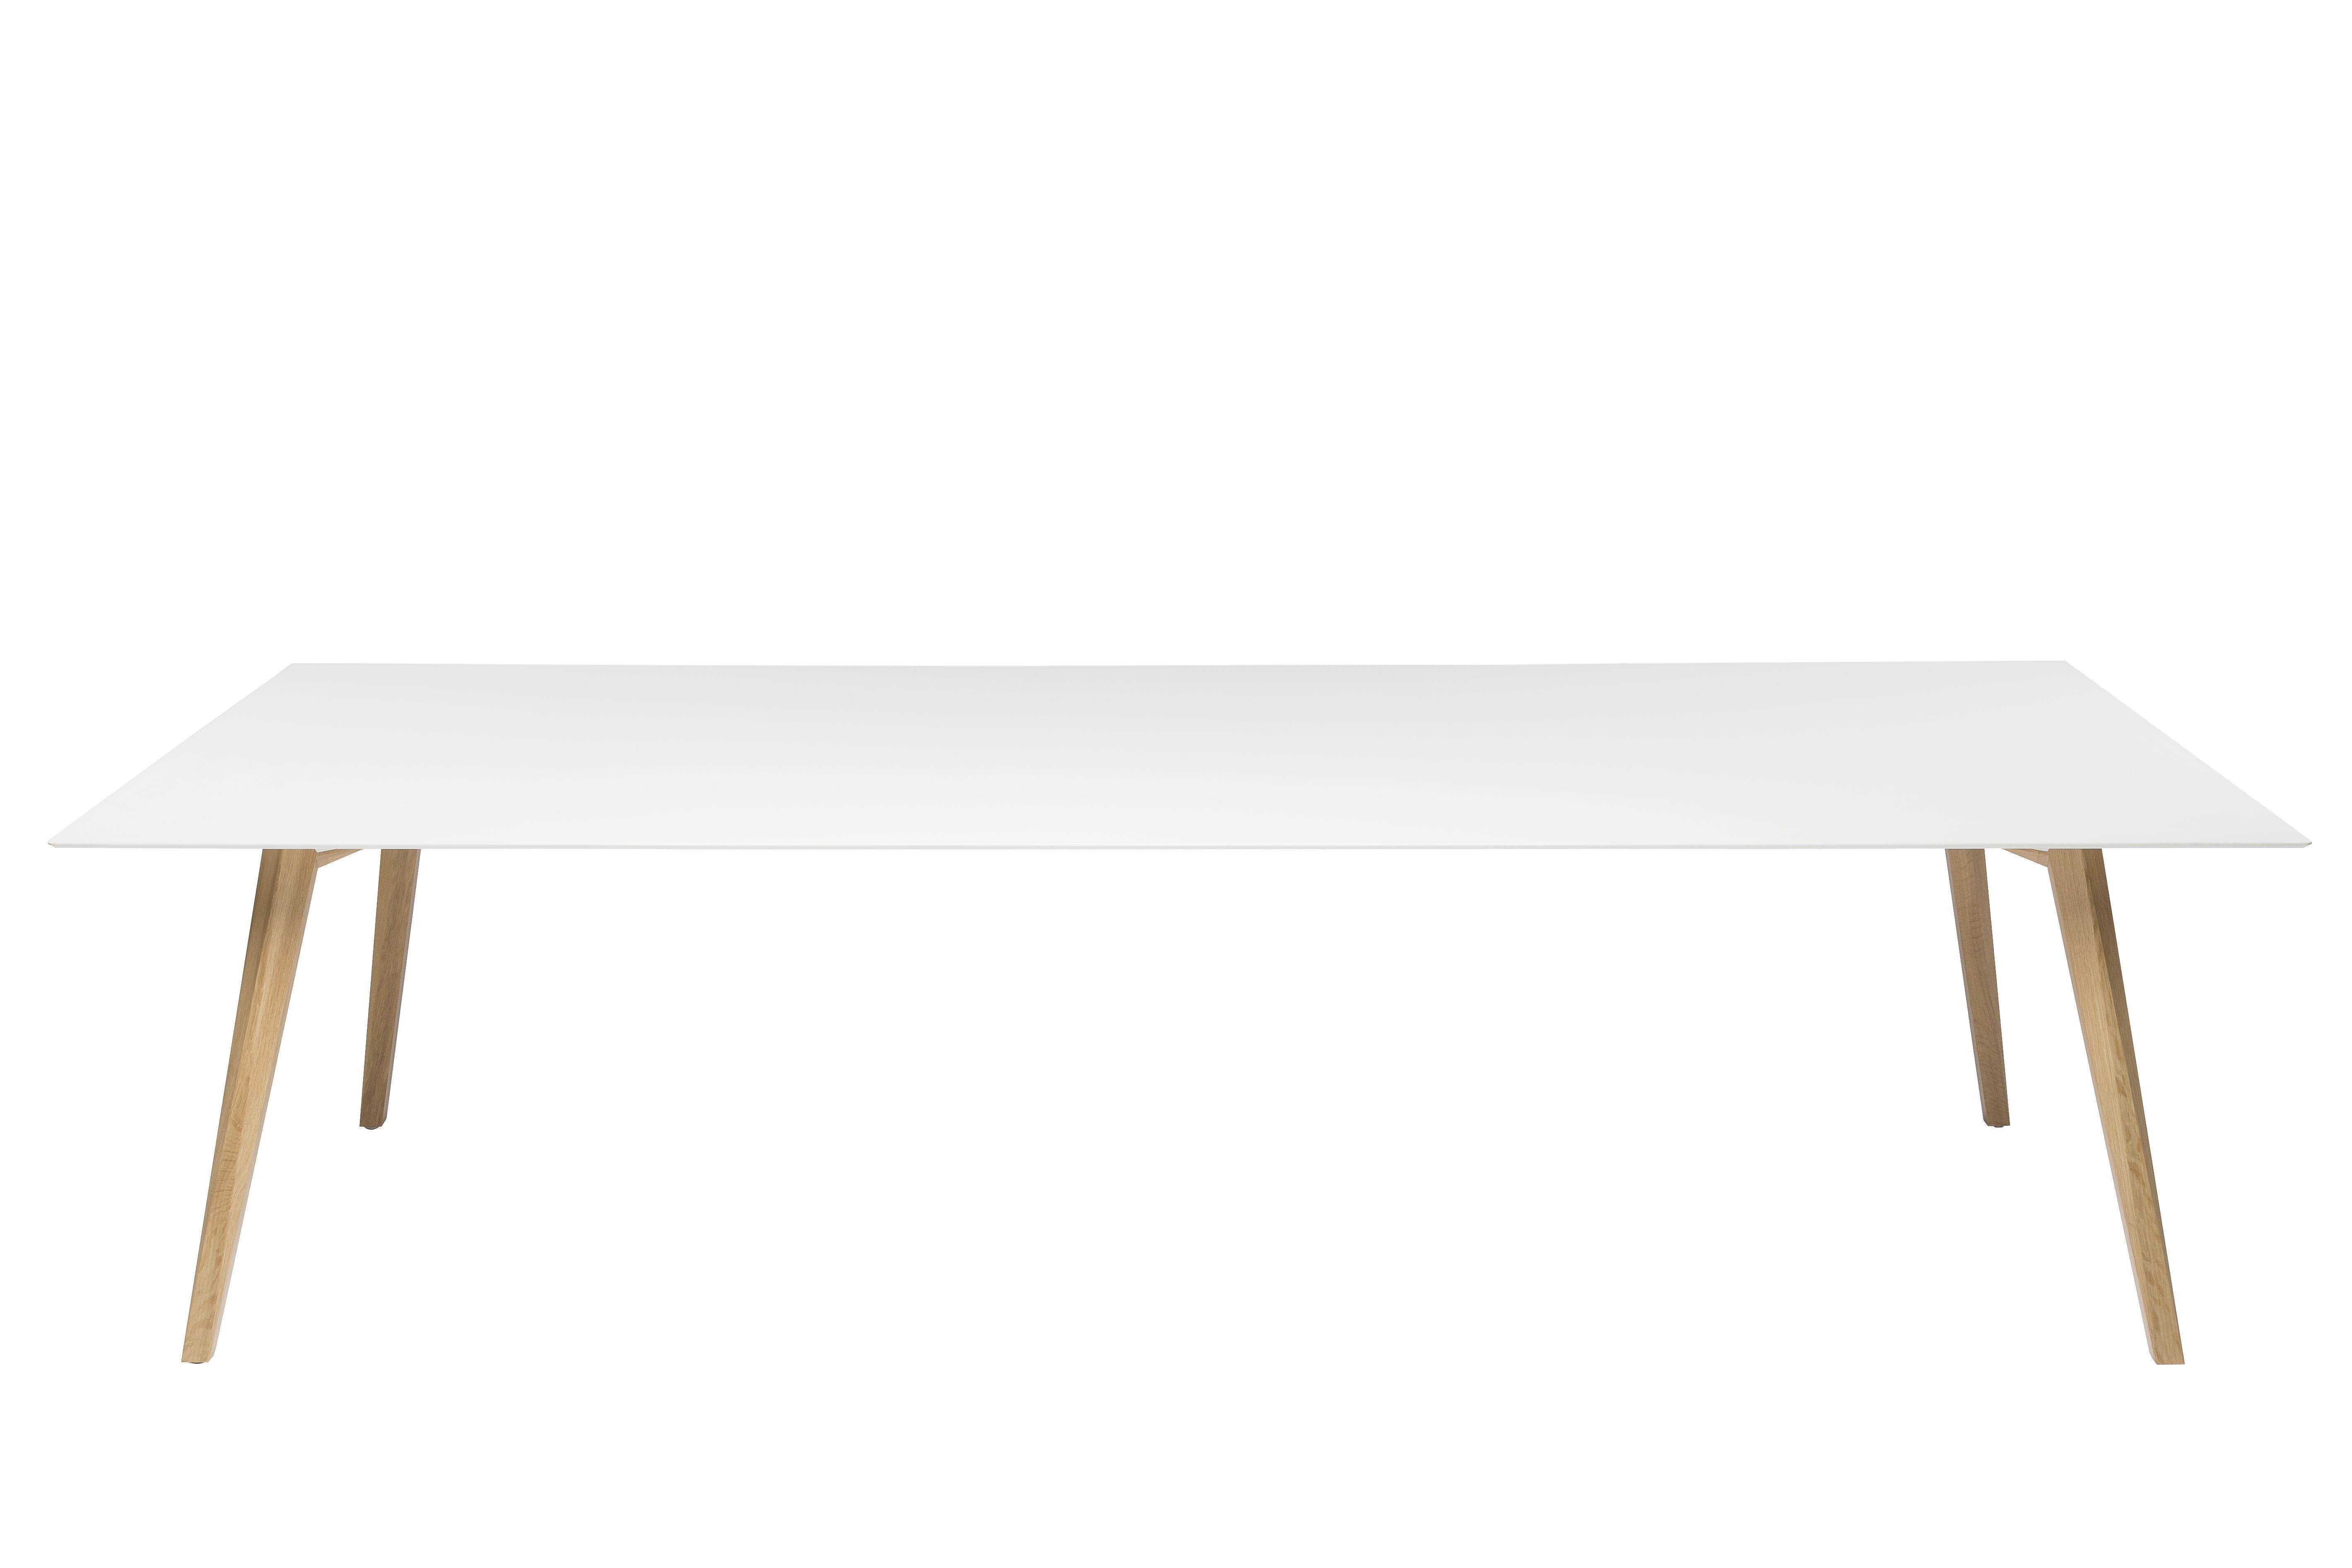 Furniture - Office Furniture - Bevel Rectangular table - / Desk - 200 x 100 cm - Wooden feet by ICF - Top : White - Legs : Wood - Aluminium, HPL, Oak